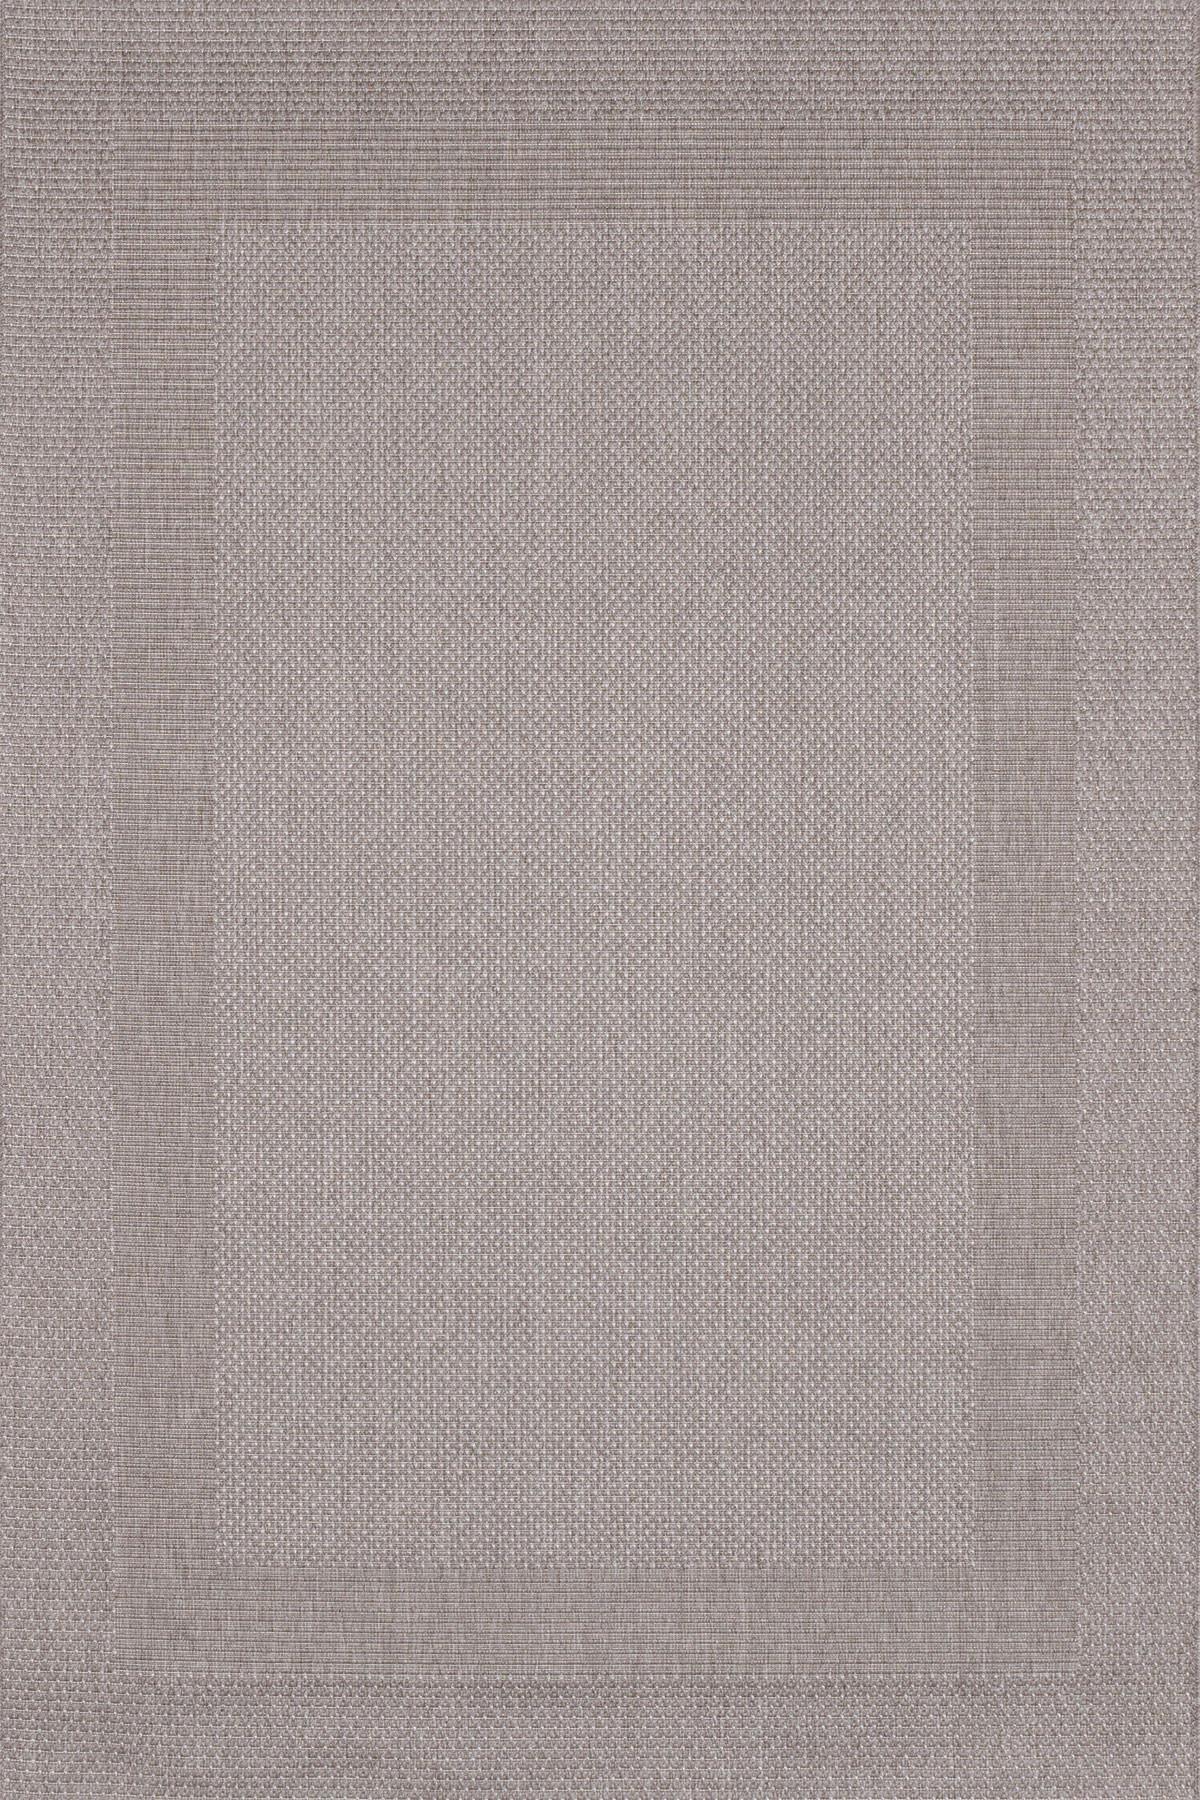 Sintelon koberce Kusový Koberec Adria 01/BEB - 200x290 cm